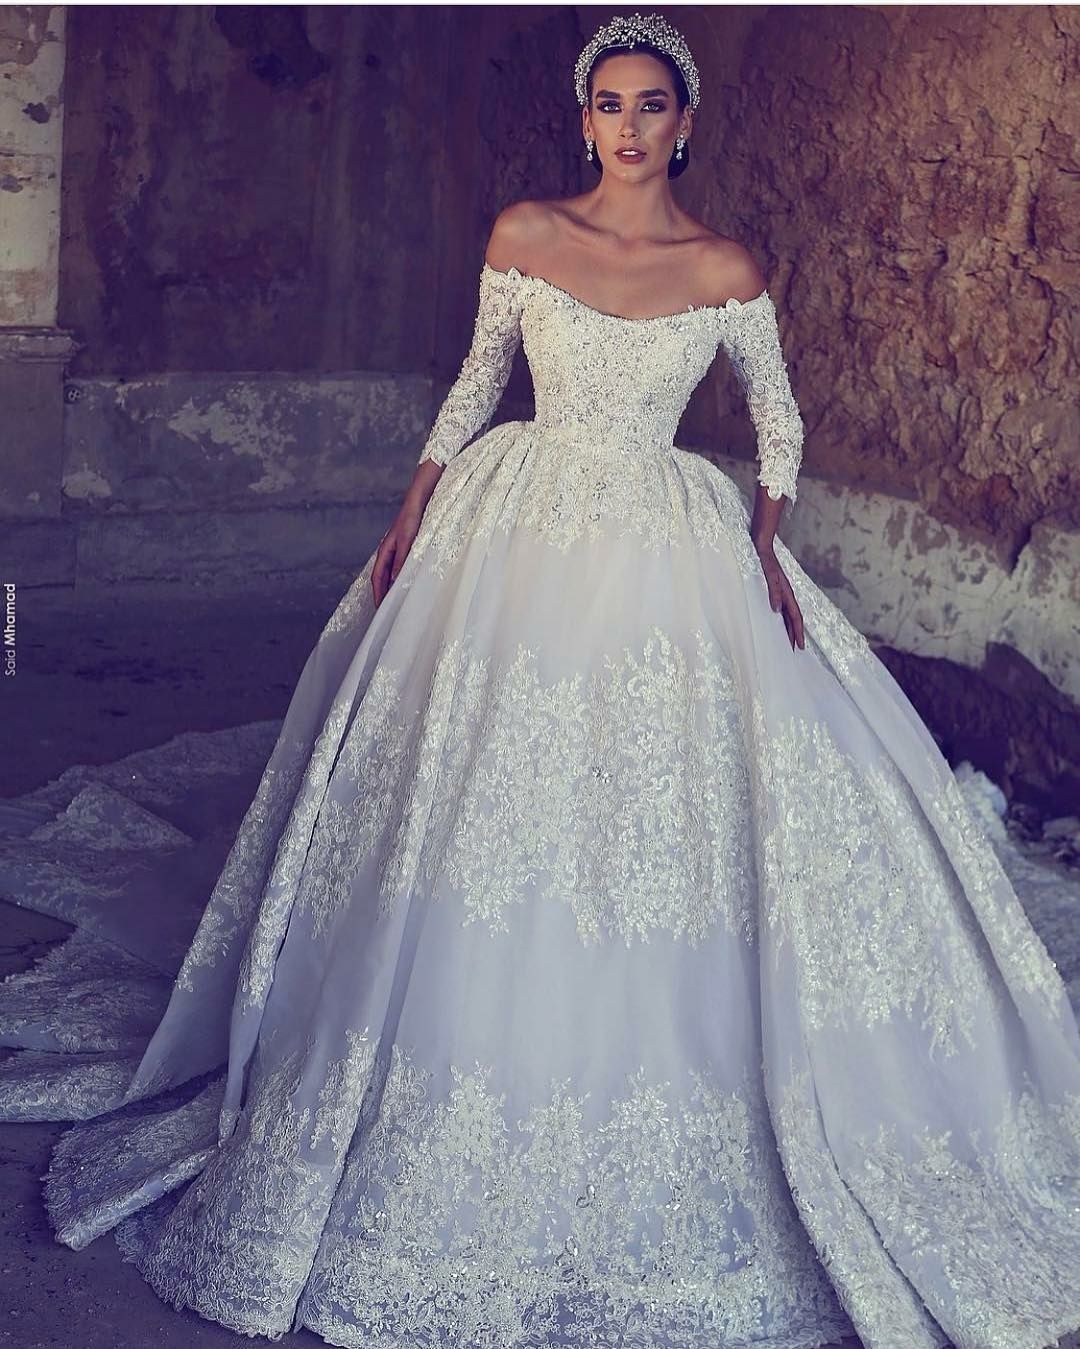 Fantástico Cost To Preserve Wedding Dress Festooning - Ideas de ...